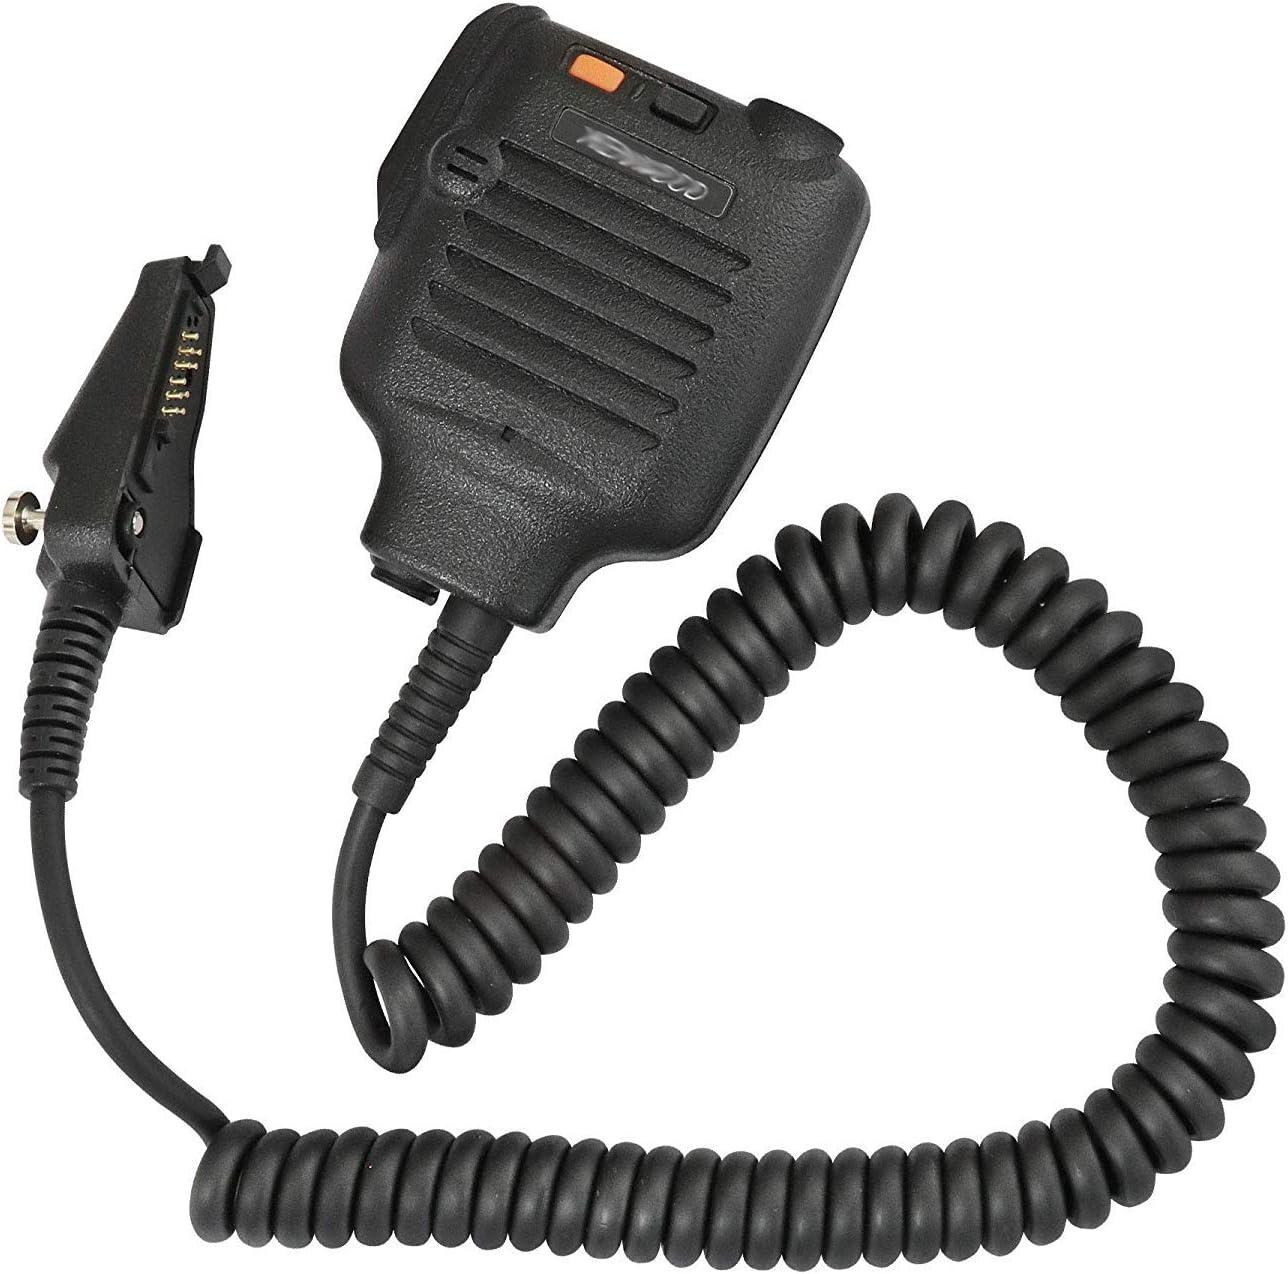 VBLL KMC-25 Speaker Mic Microphone for Kenwood NX-200 NX-210 NX-300 NX-3200 NX-3300 NX-410 NX-411 NX-5200 NX-5300 NX-5400 TK-2180 TK-3180 TK-5210 TK-5220 TK-5310 TK-5410 Portable Radio